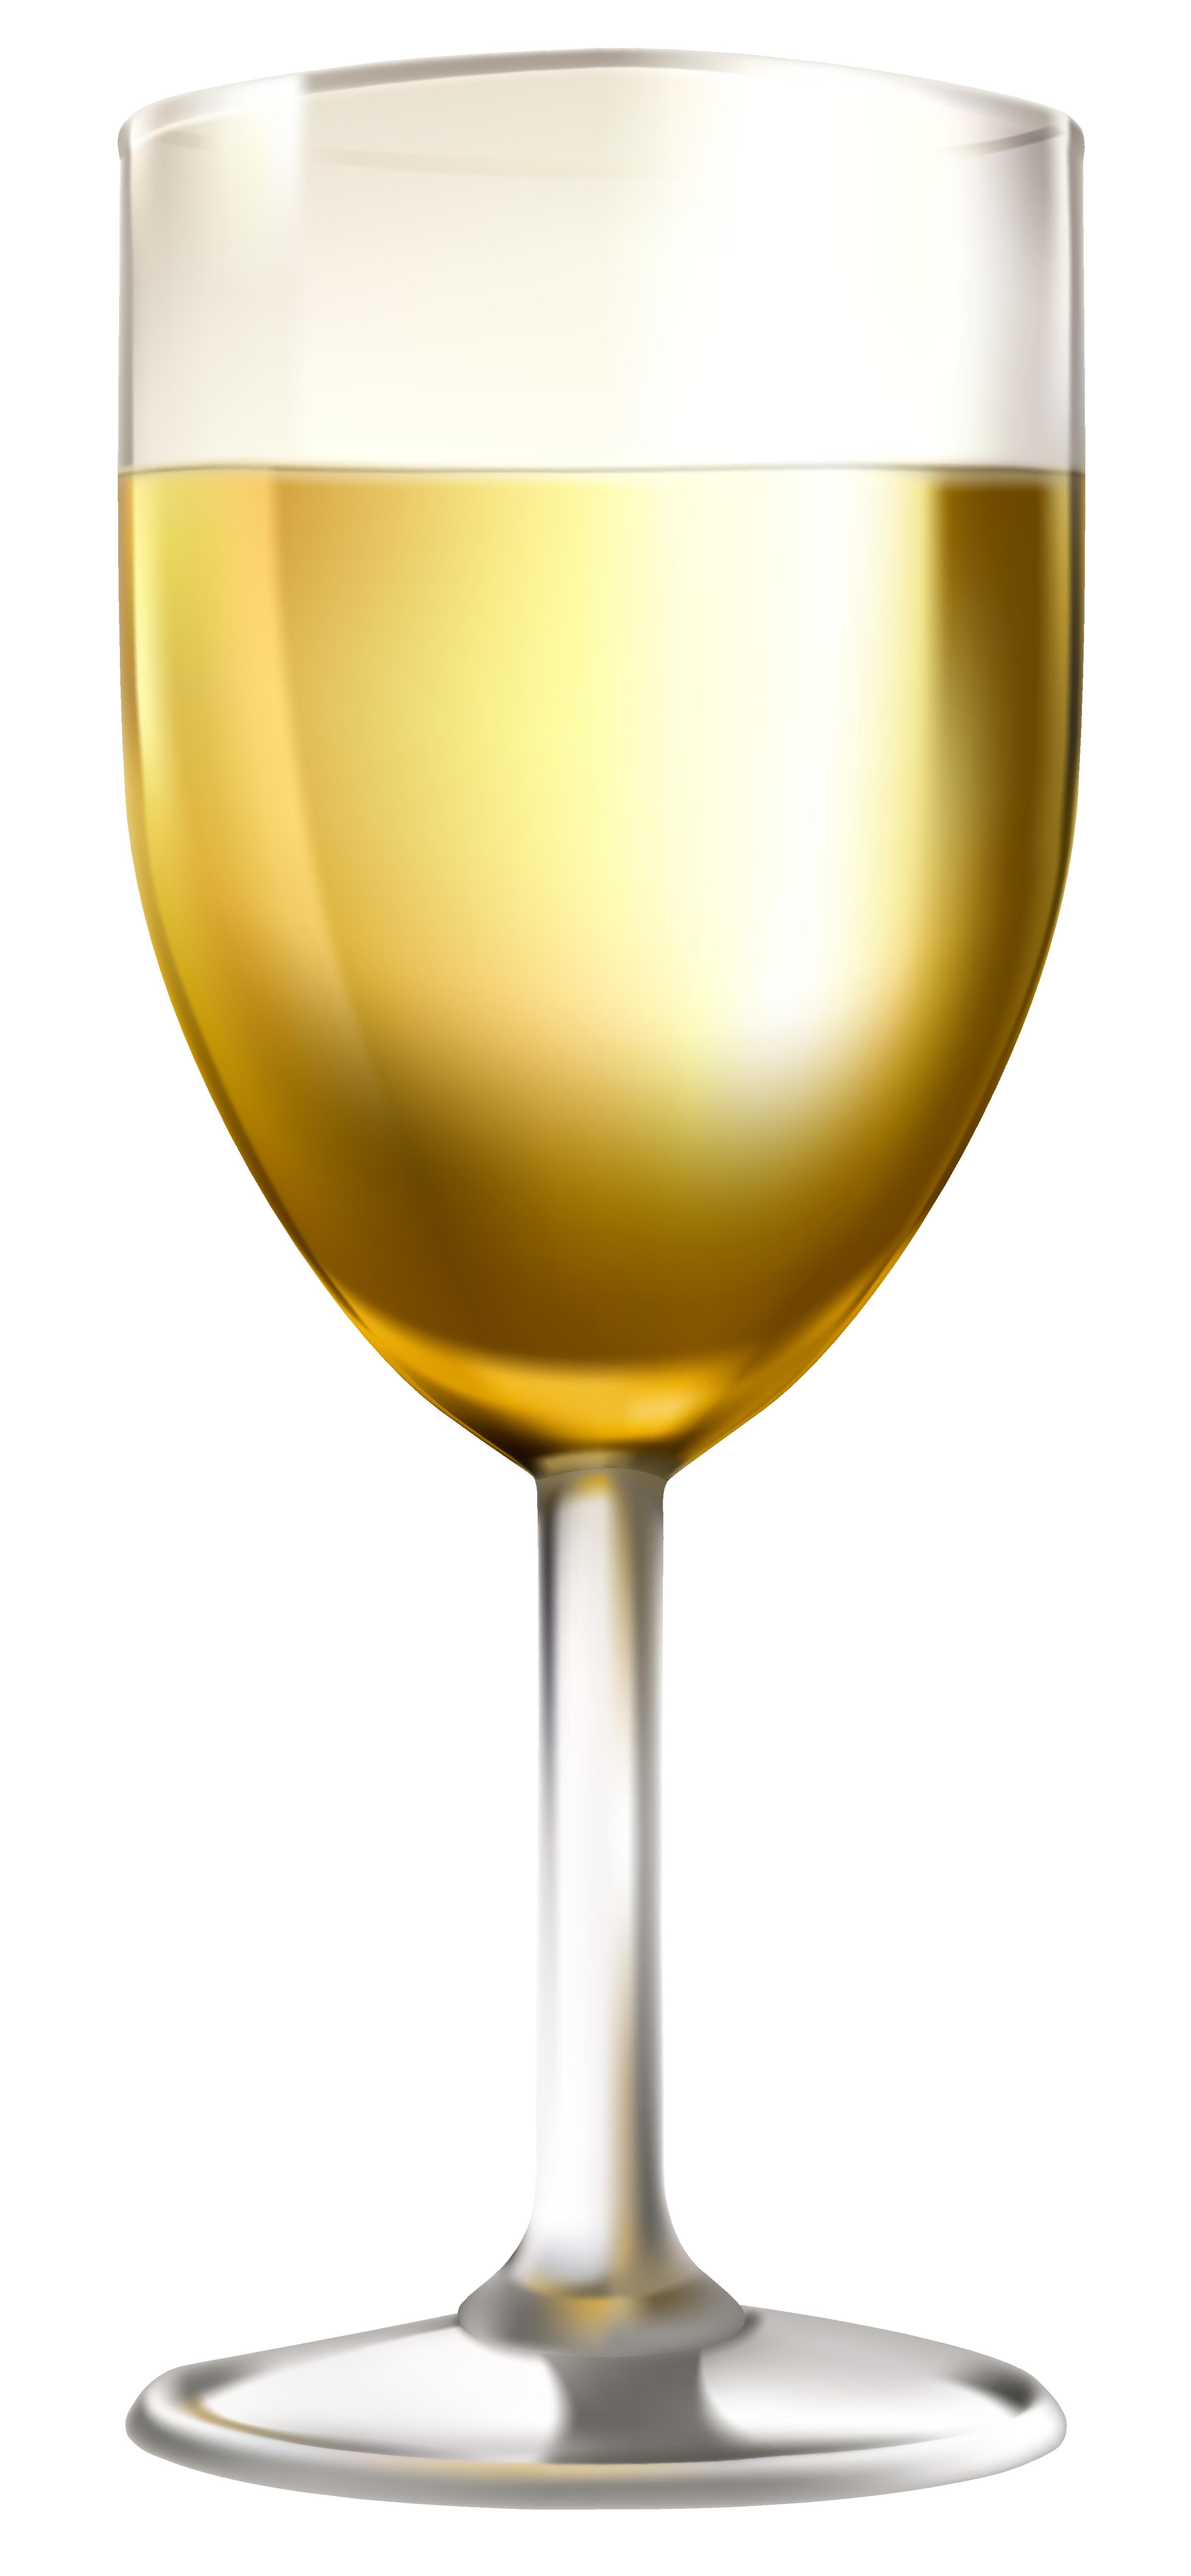 White wine Red Wine Cocktail Wine glass.